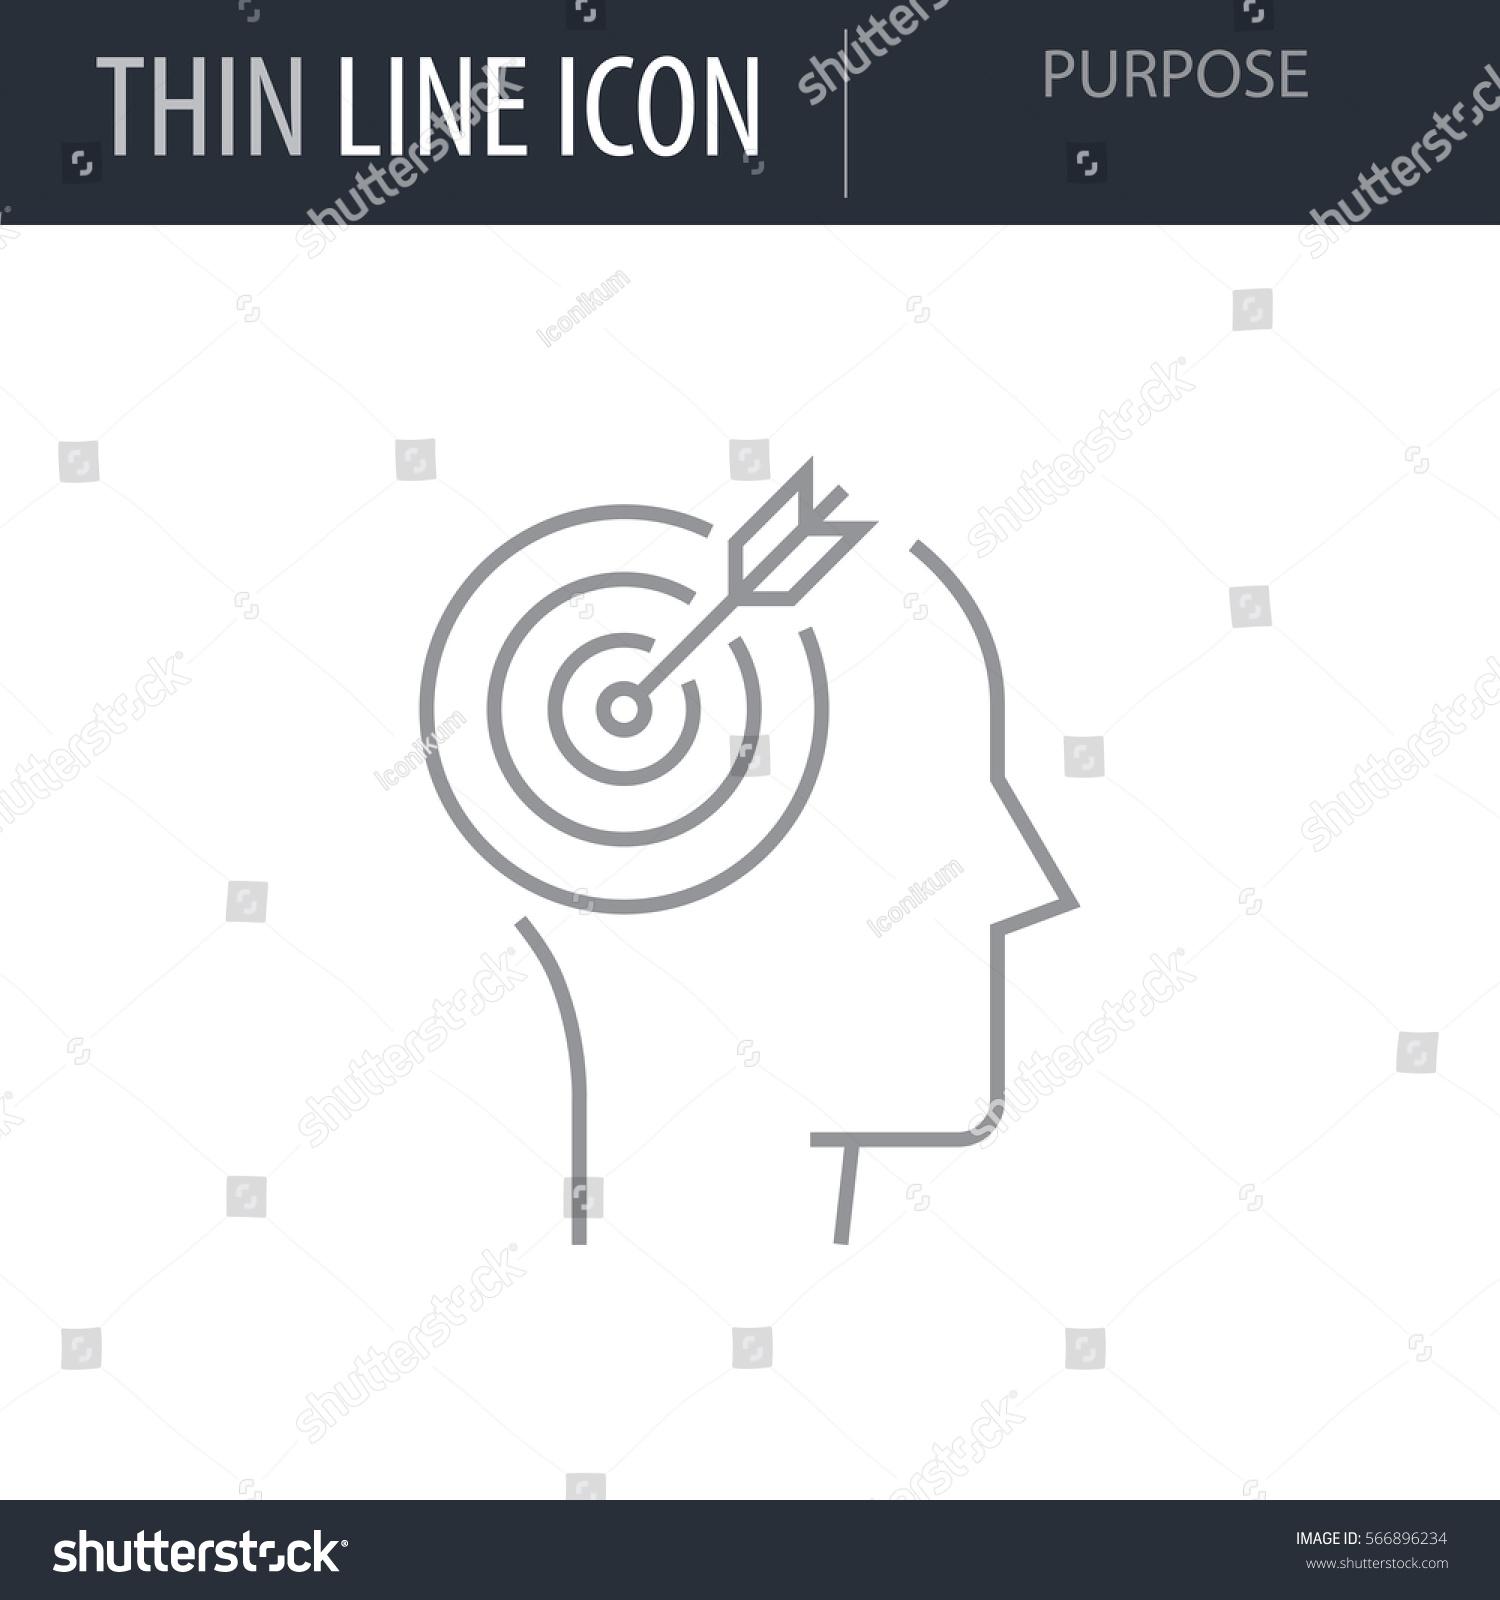 Symbol Purpose Thin Line Icon Icons Stock Vector Royalty Free